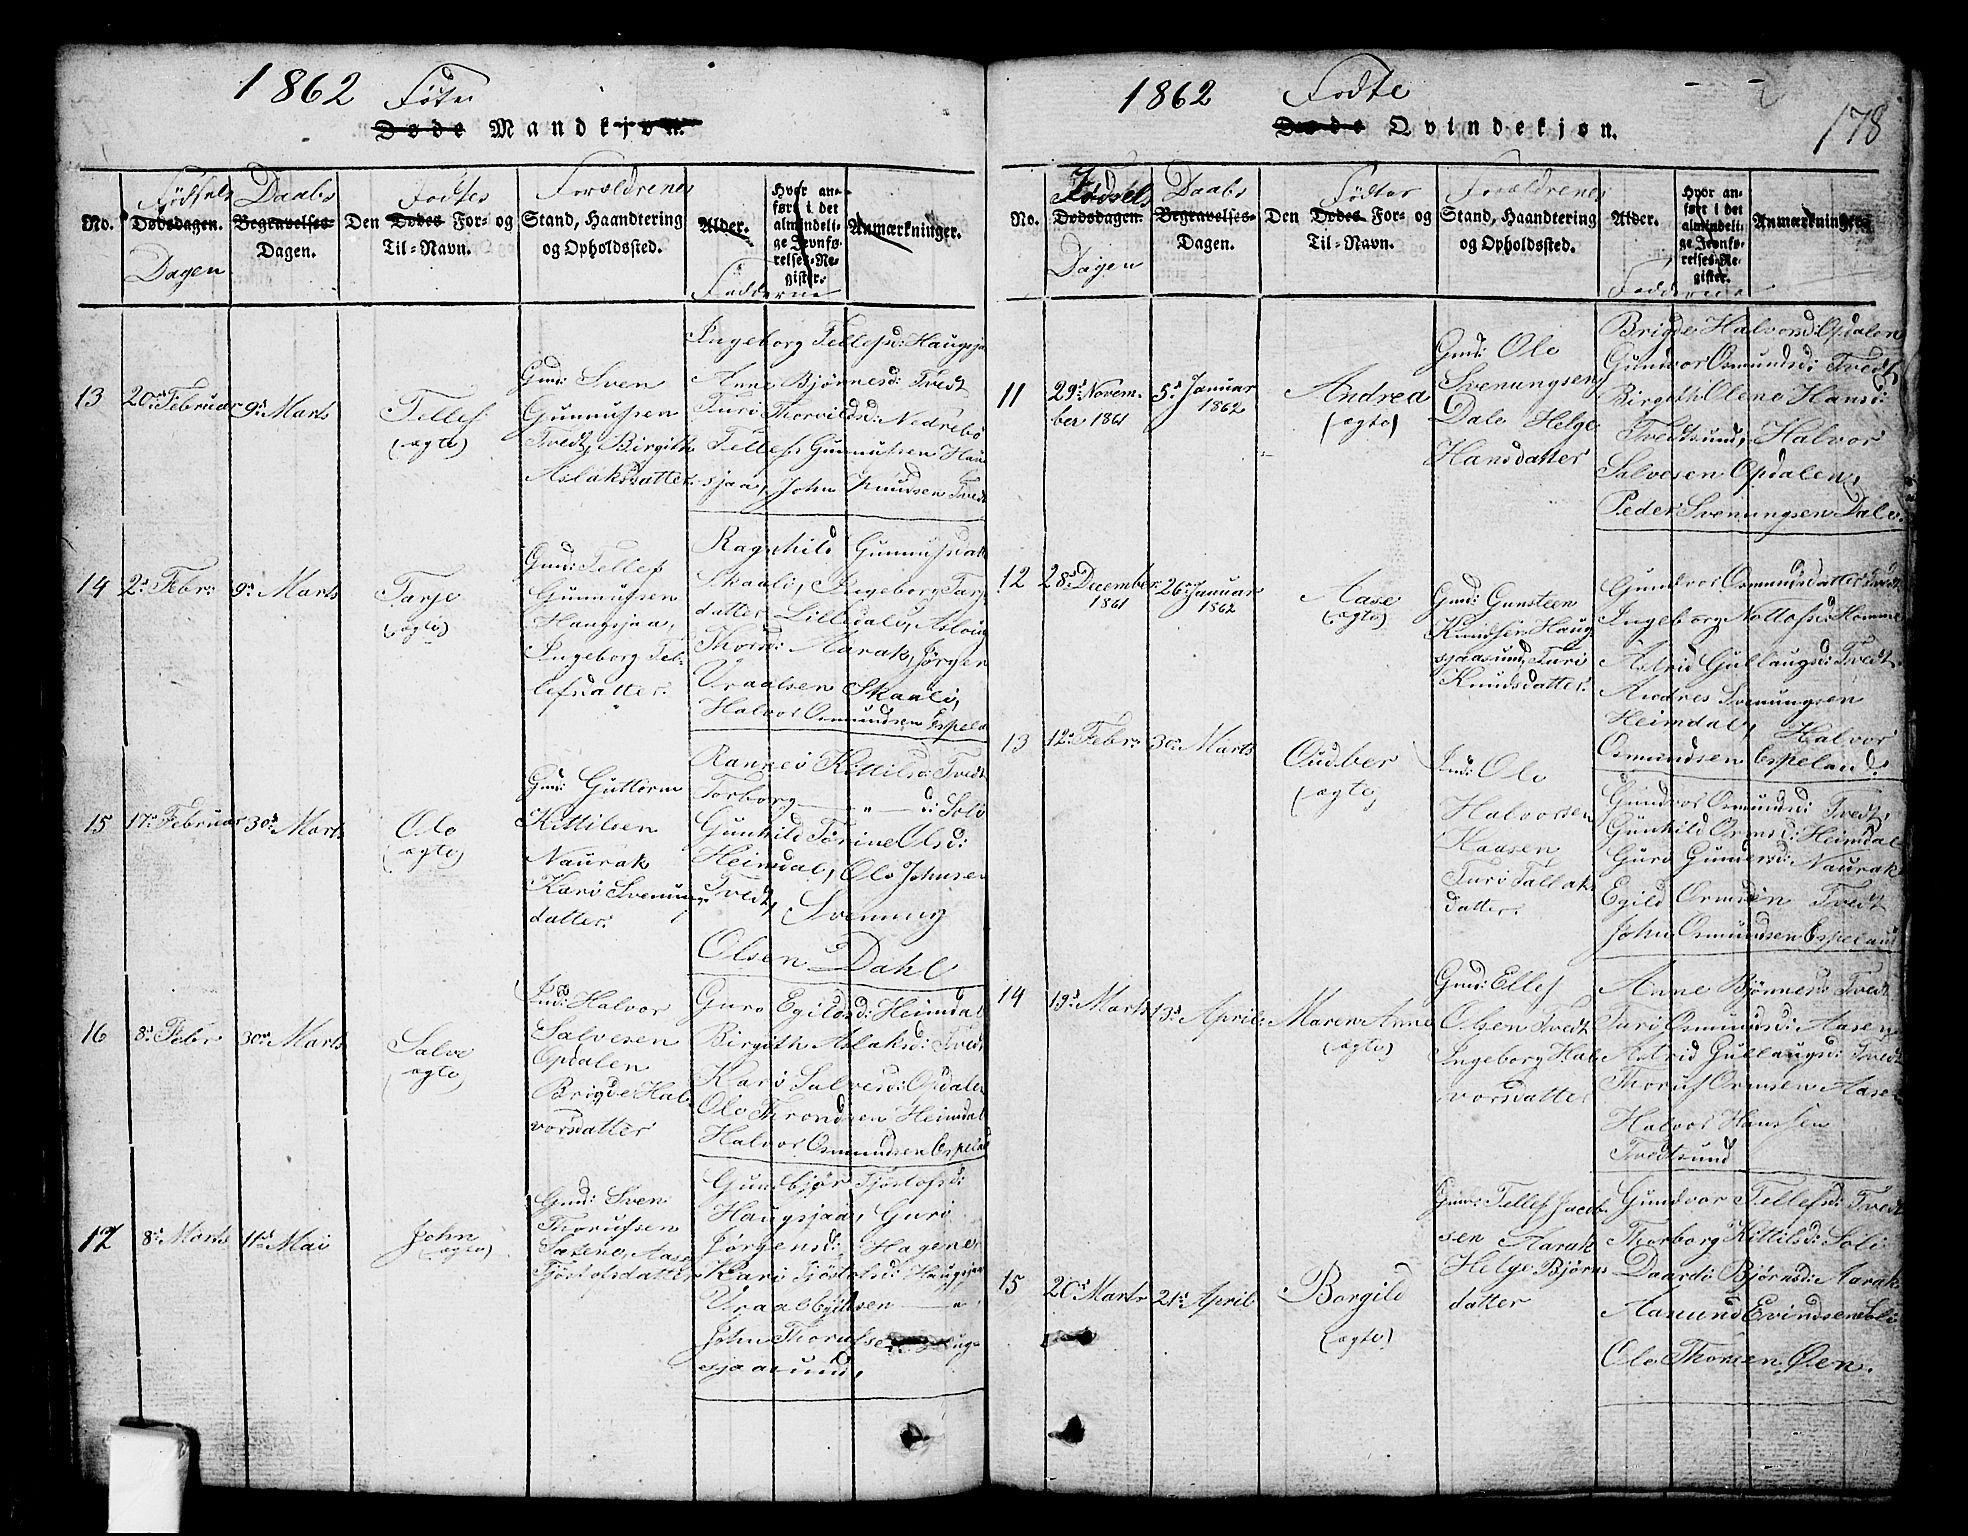 SAKO, Nissedal kirkebøker, G/Gb/L0001: Klokkerbok nr. II 1, 1814-1862, s. 178